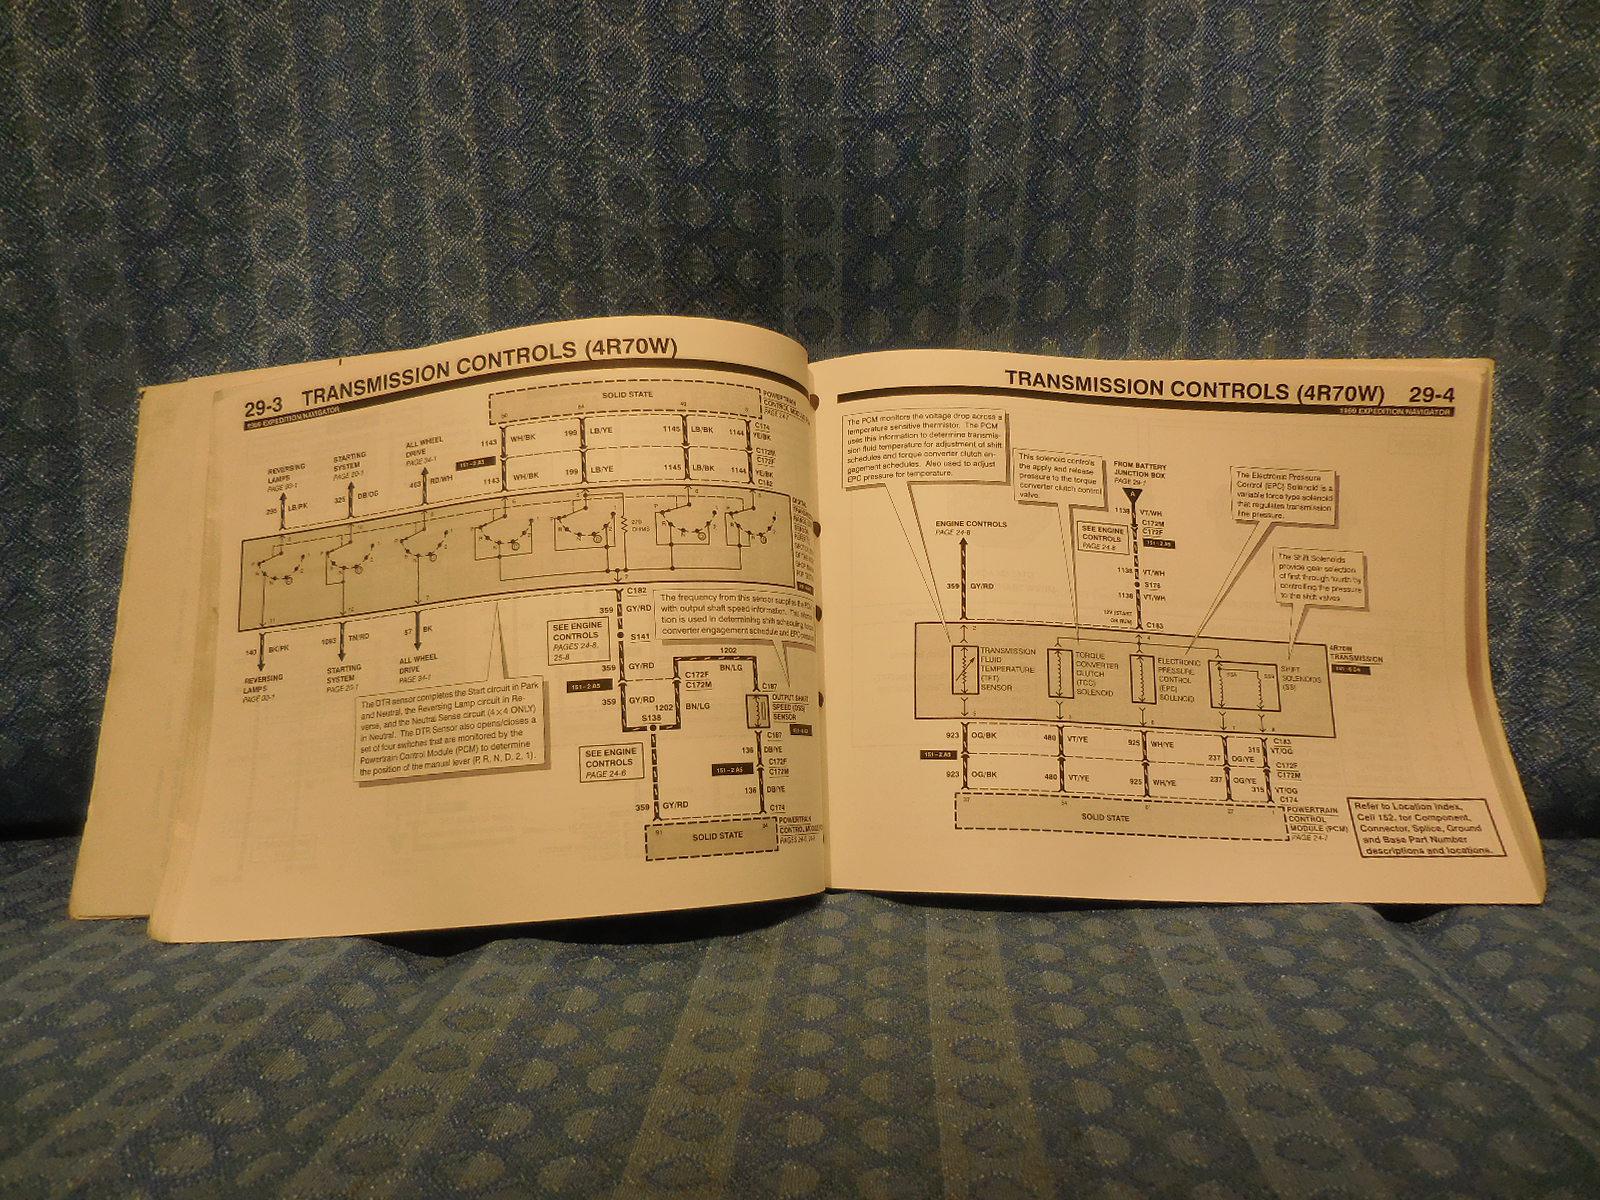 E46 Hvac Diagram Free Download Wiring Diagram Schematic